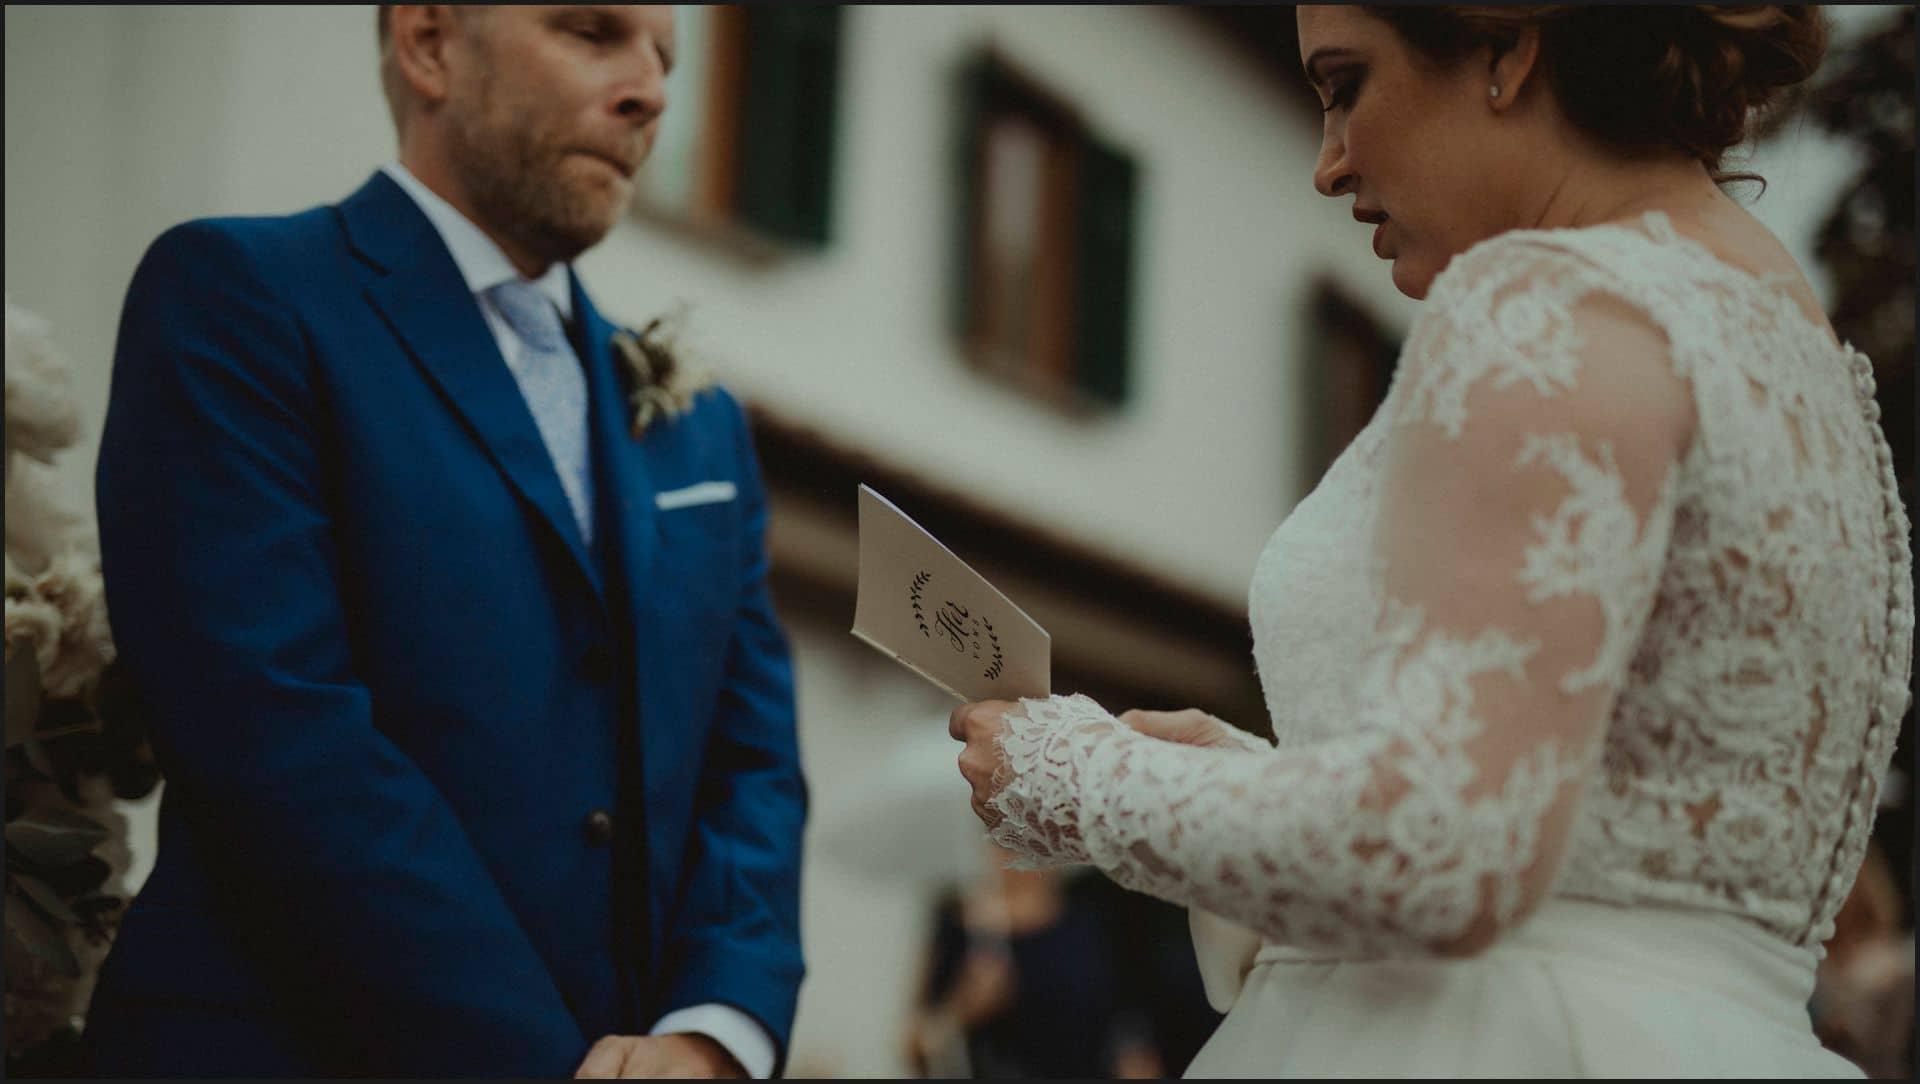 tuscany, destination wedding, chianti, wedding ceremony, vows